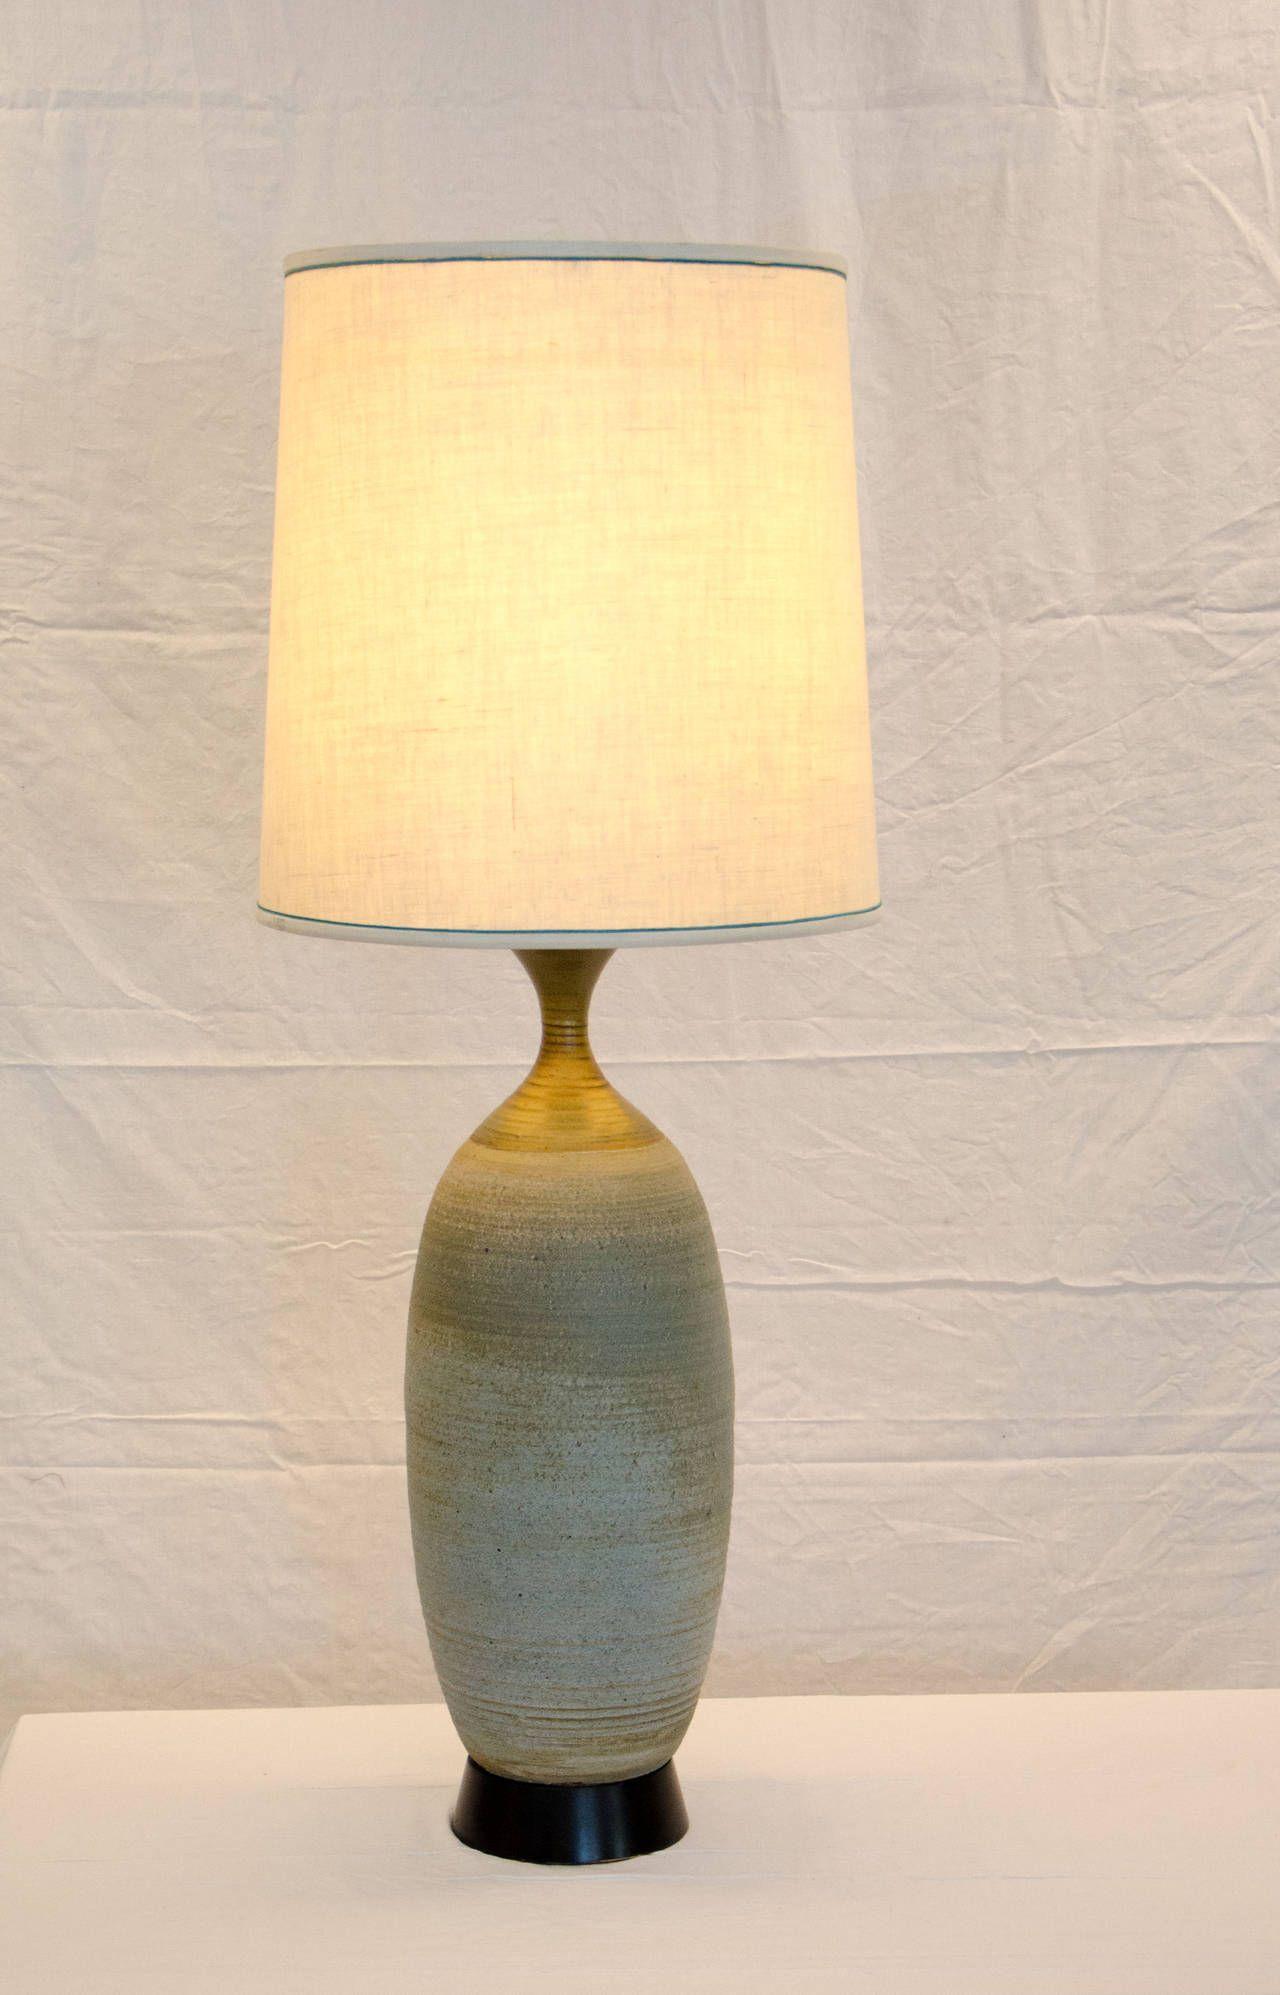 Mid Century Studio Pottery Table Lamp By Bob Kinzie Ceramic LampsModern